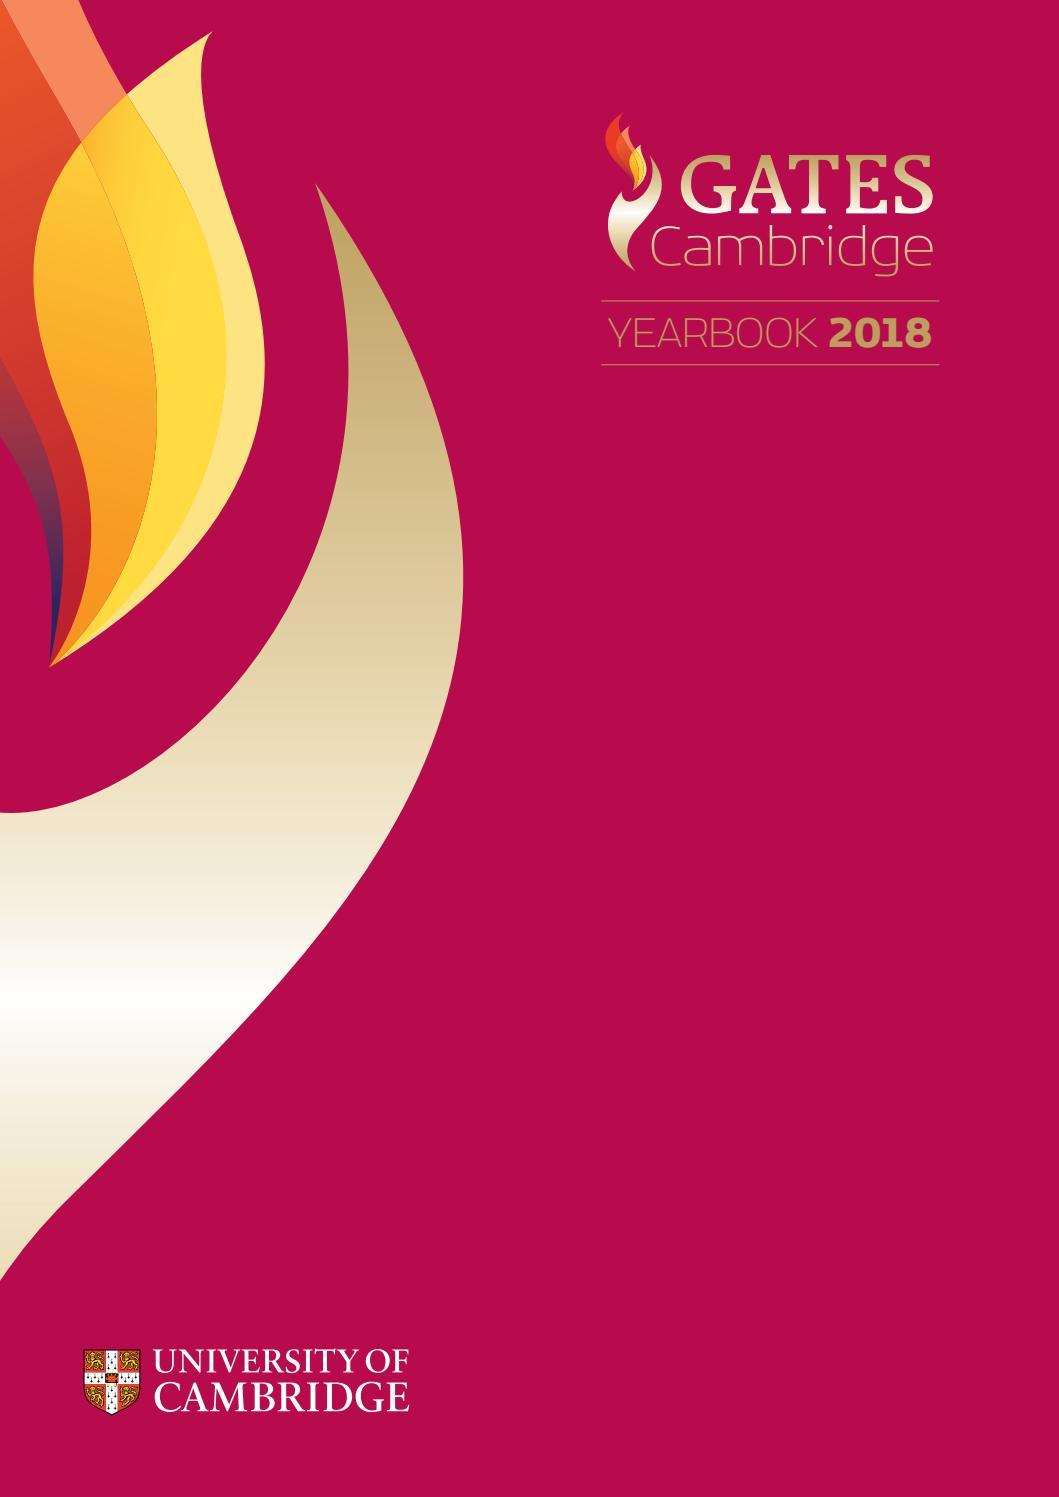 Gates Cambridge Yearbook 2018 by Gates Cambridge - issuu